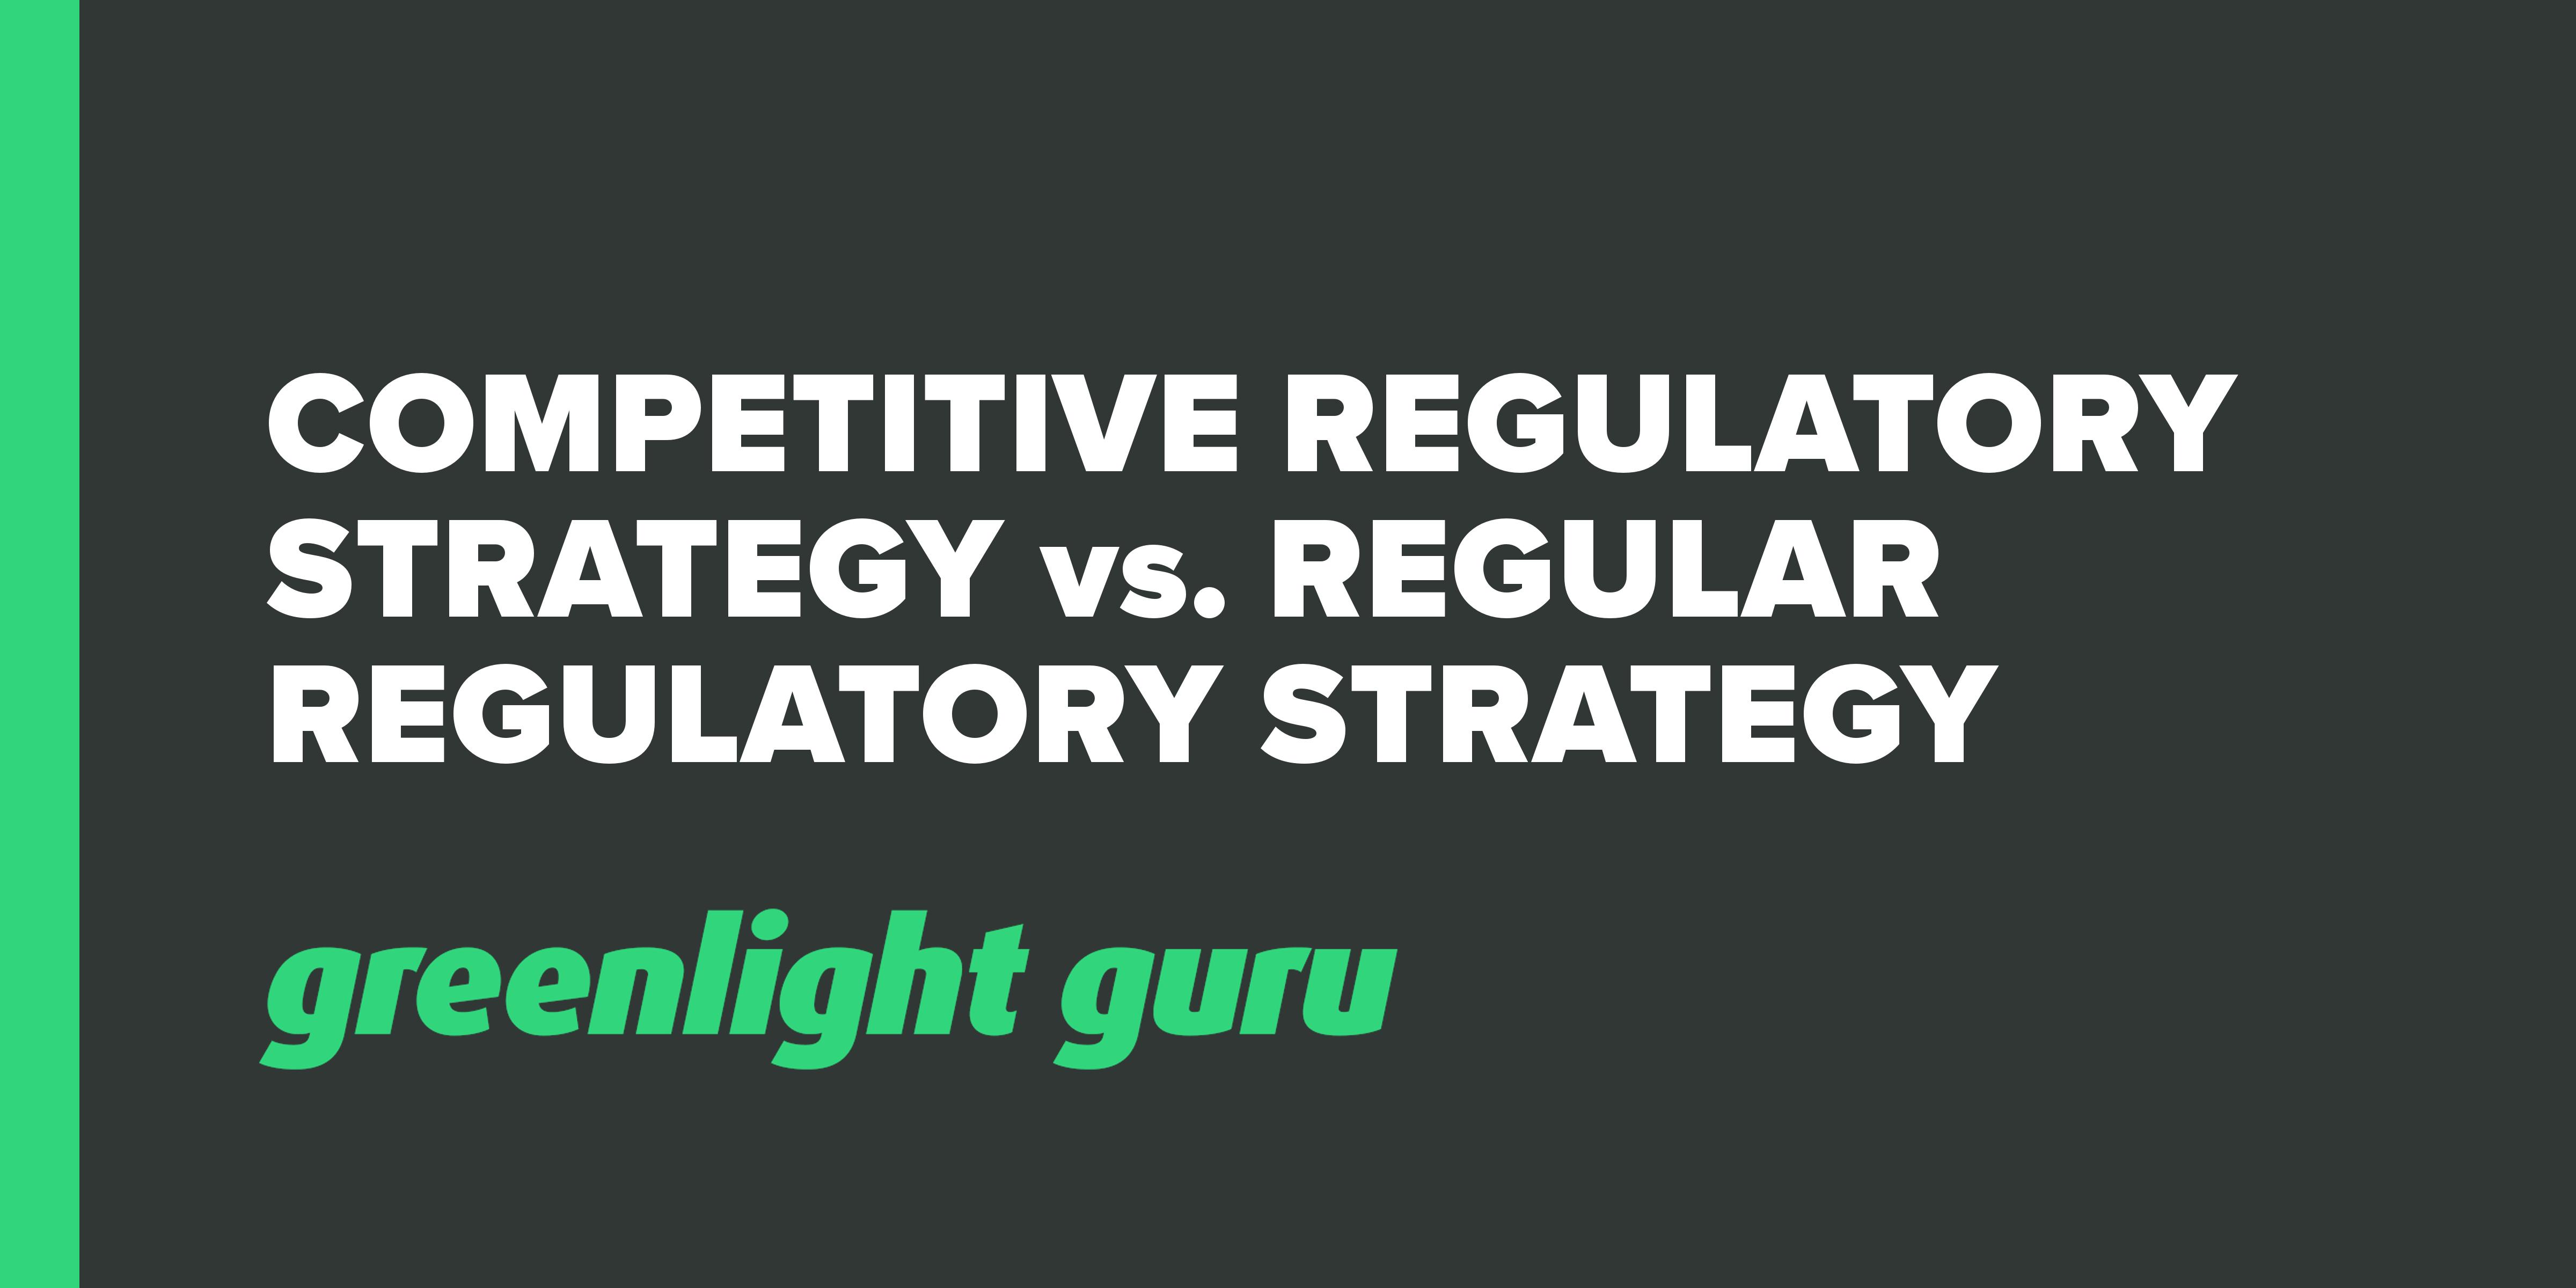 Competitive Regulatory Strategy vs. Regular Regulatory Strategy - Featured Image